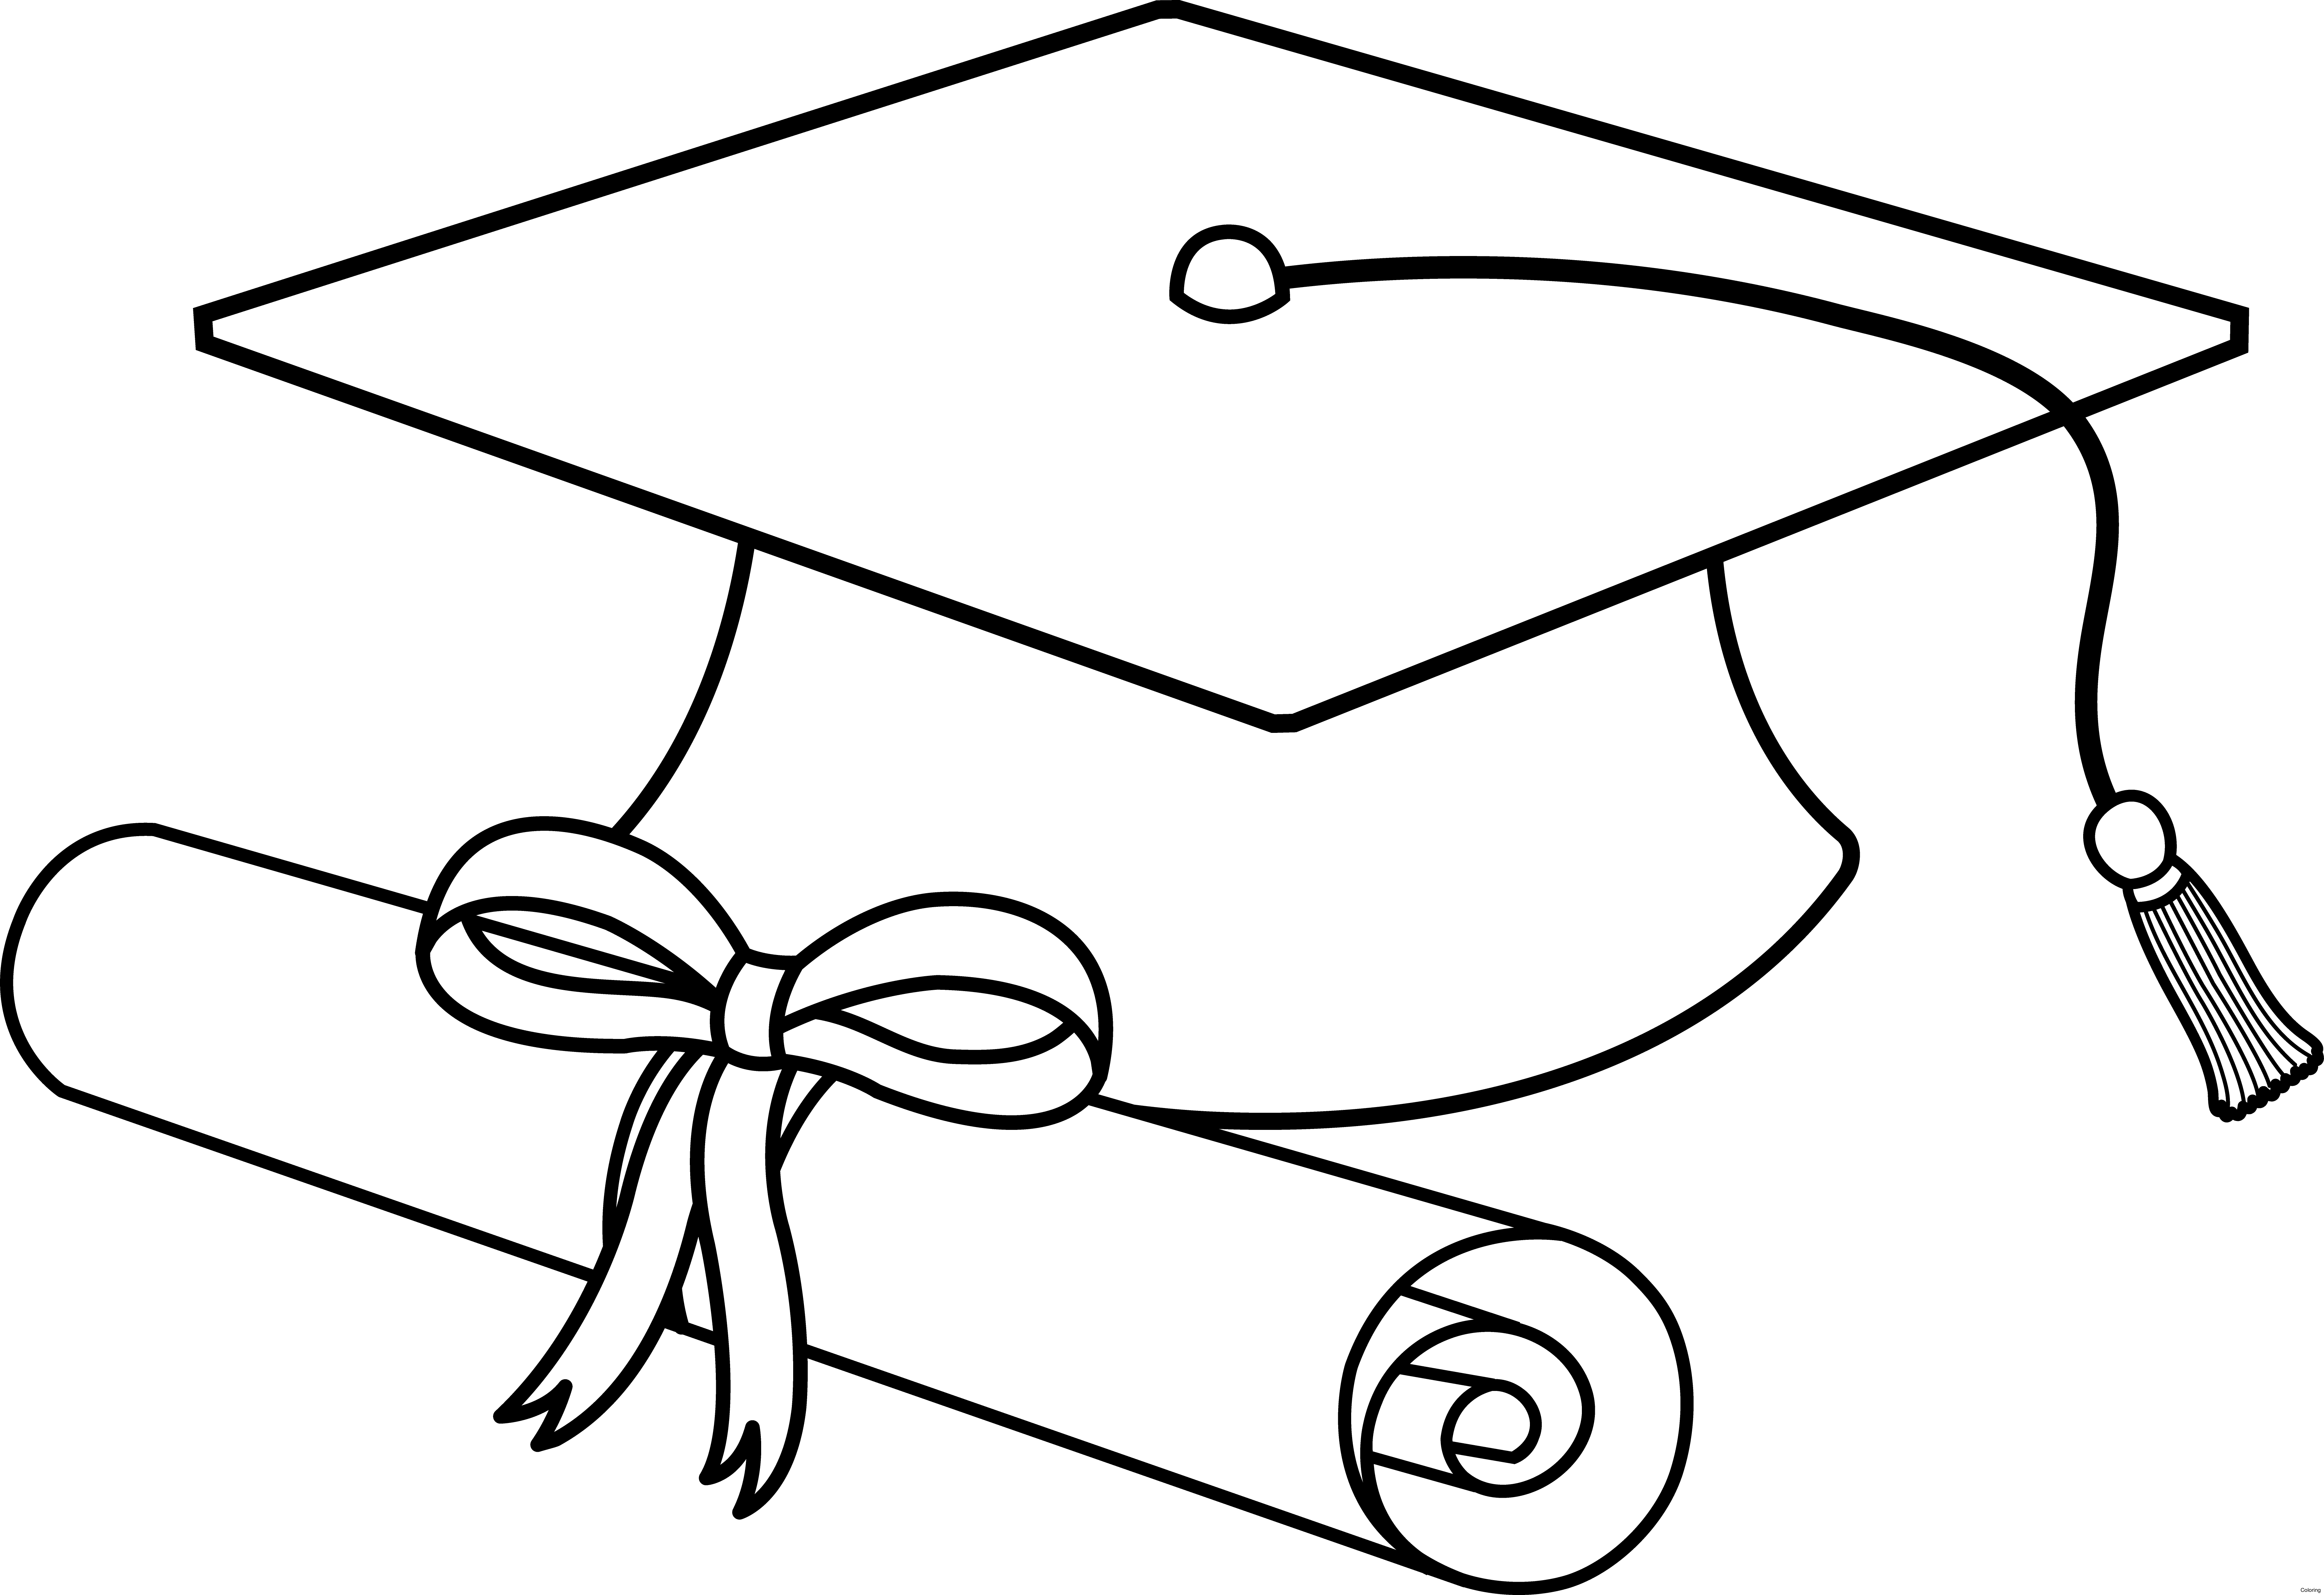 Graduate clipart african american, Graduate african american.